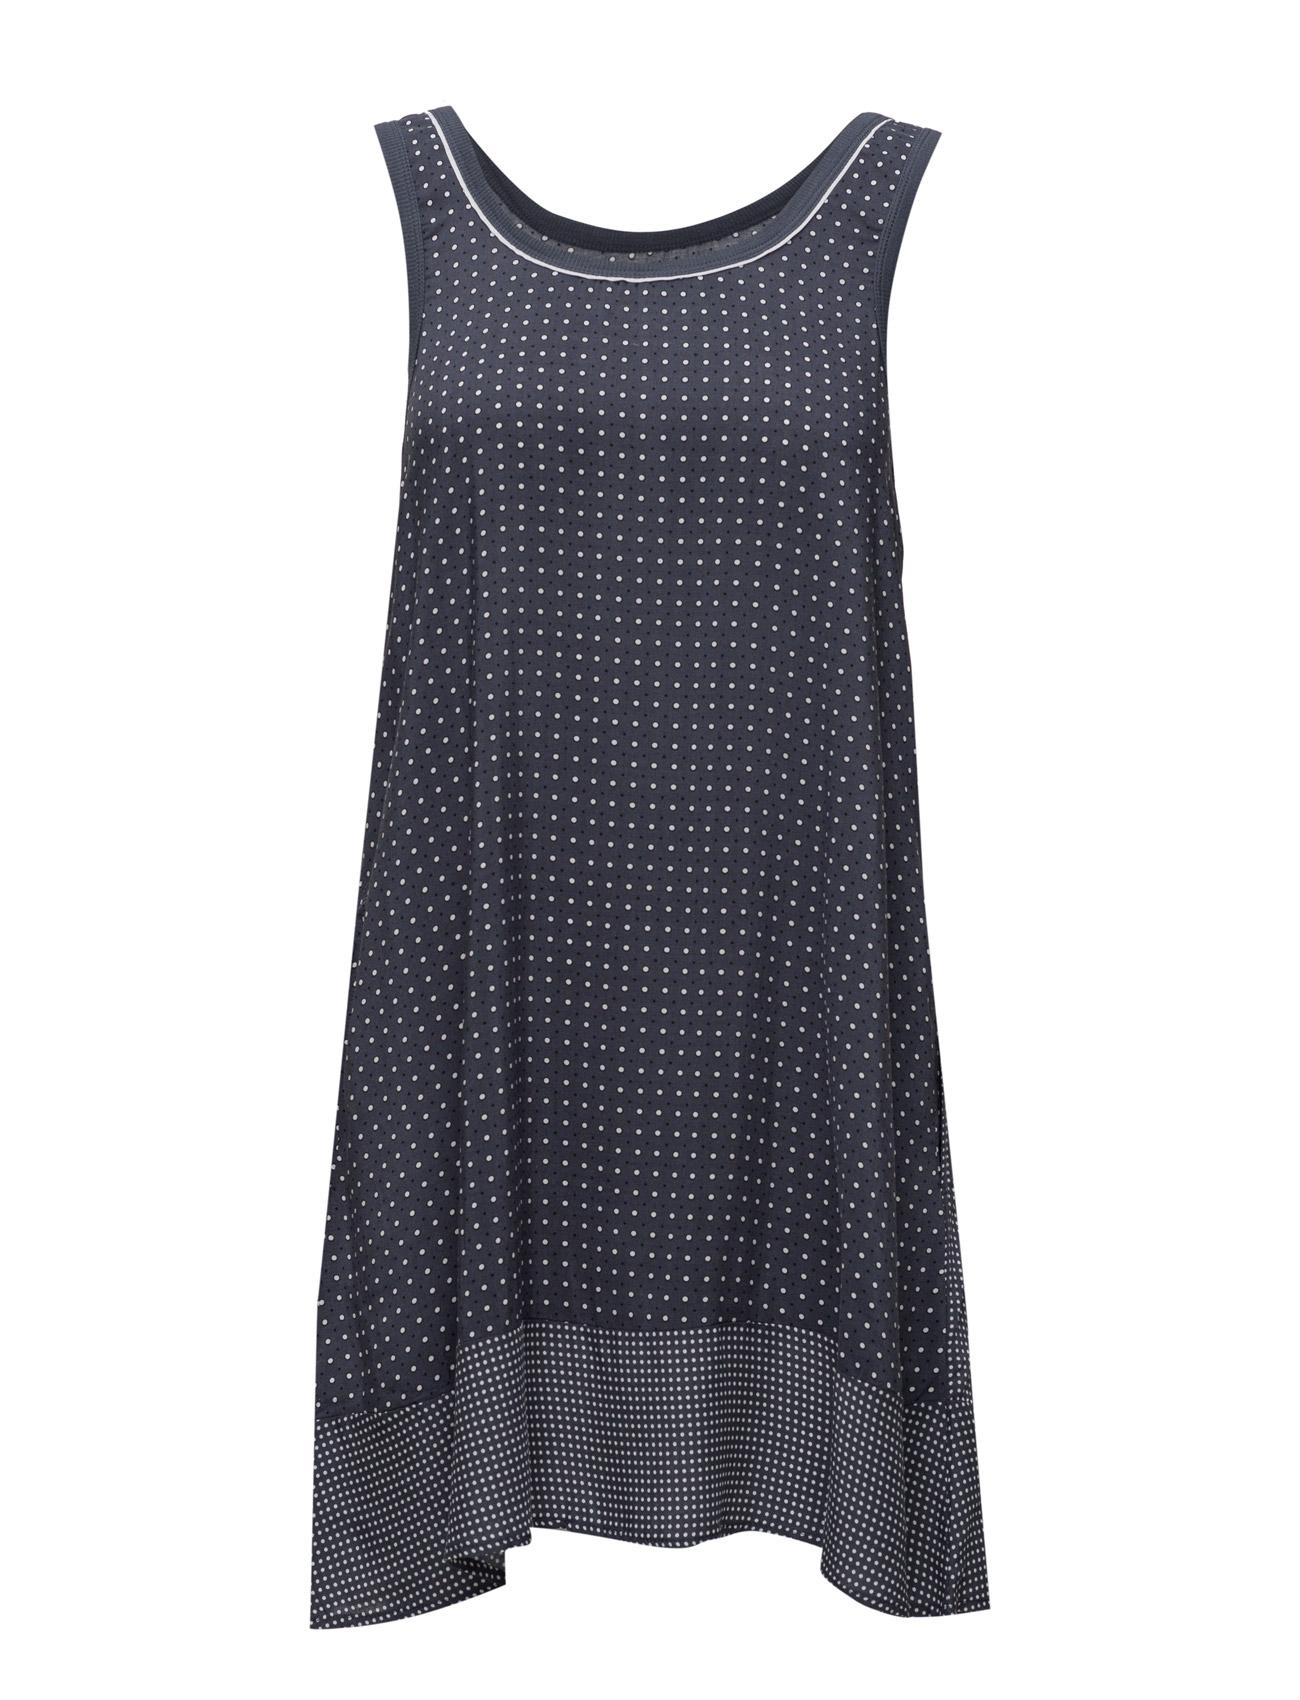 Dkny Madison Avenue Favorites Chemise DKNY Homewear Nattøj til Damer i